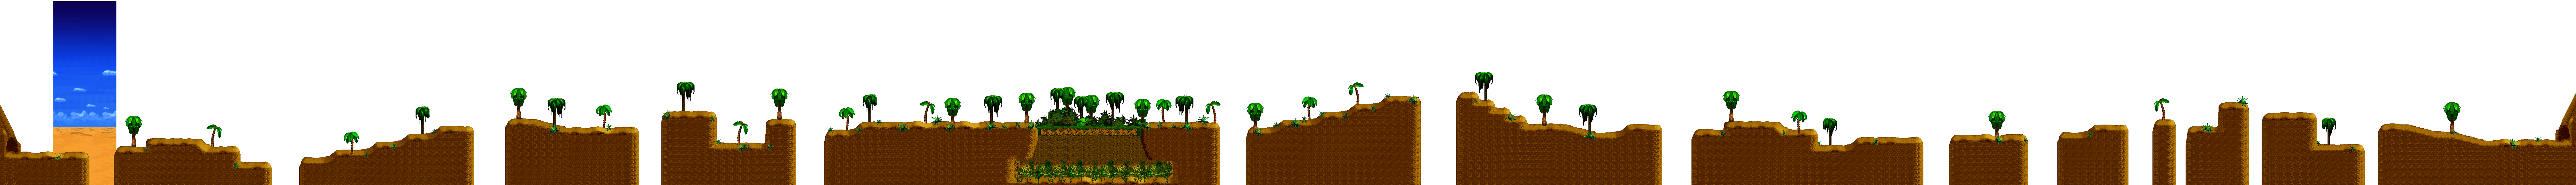 Desert oasis level by Phyreburnz